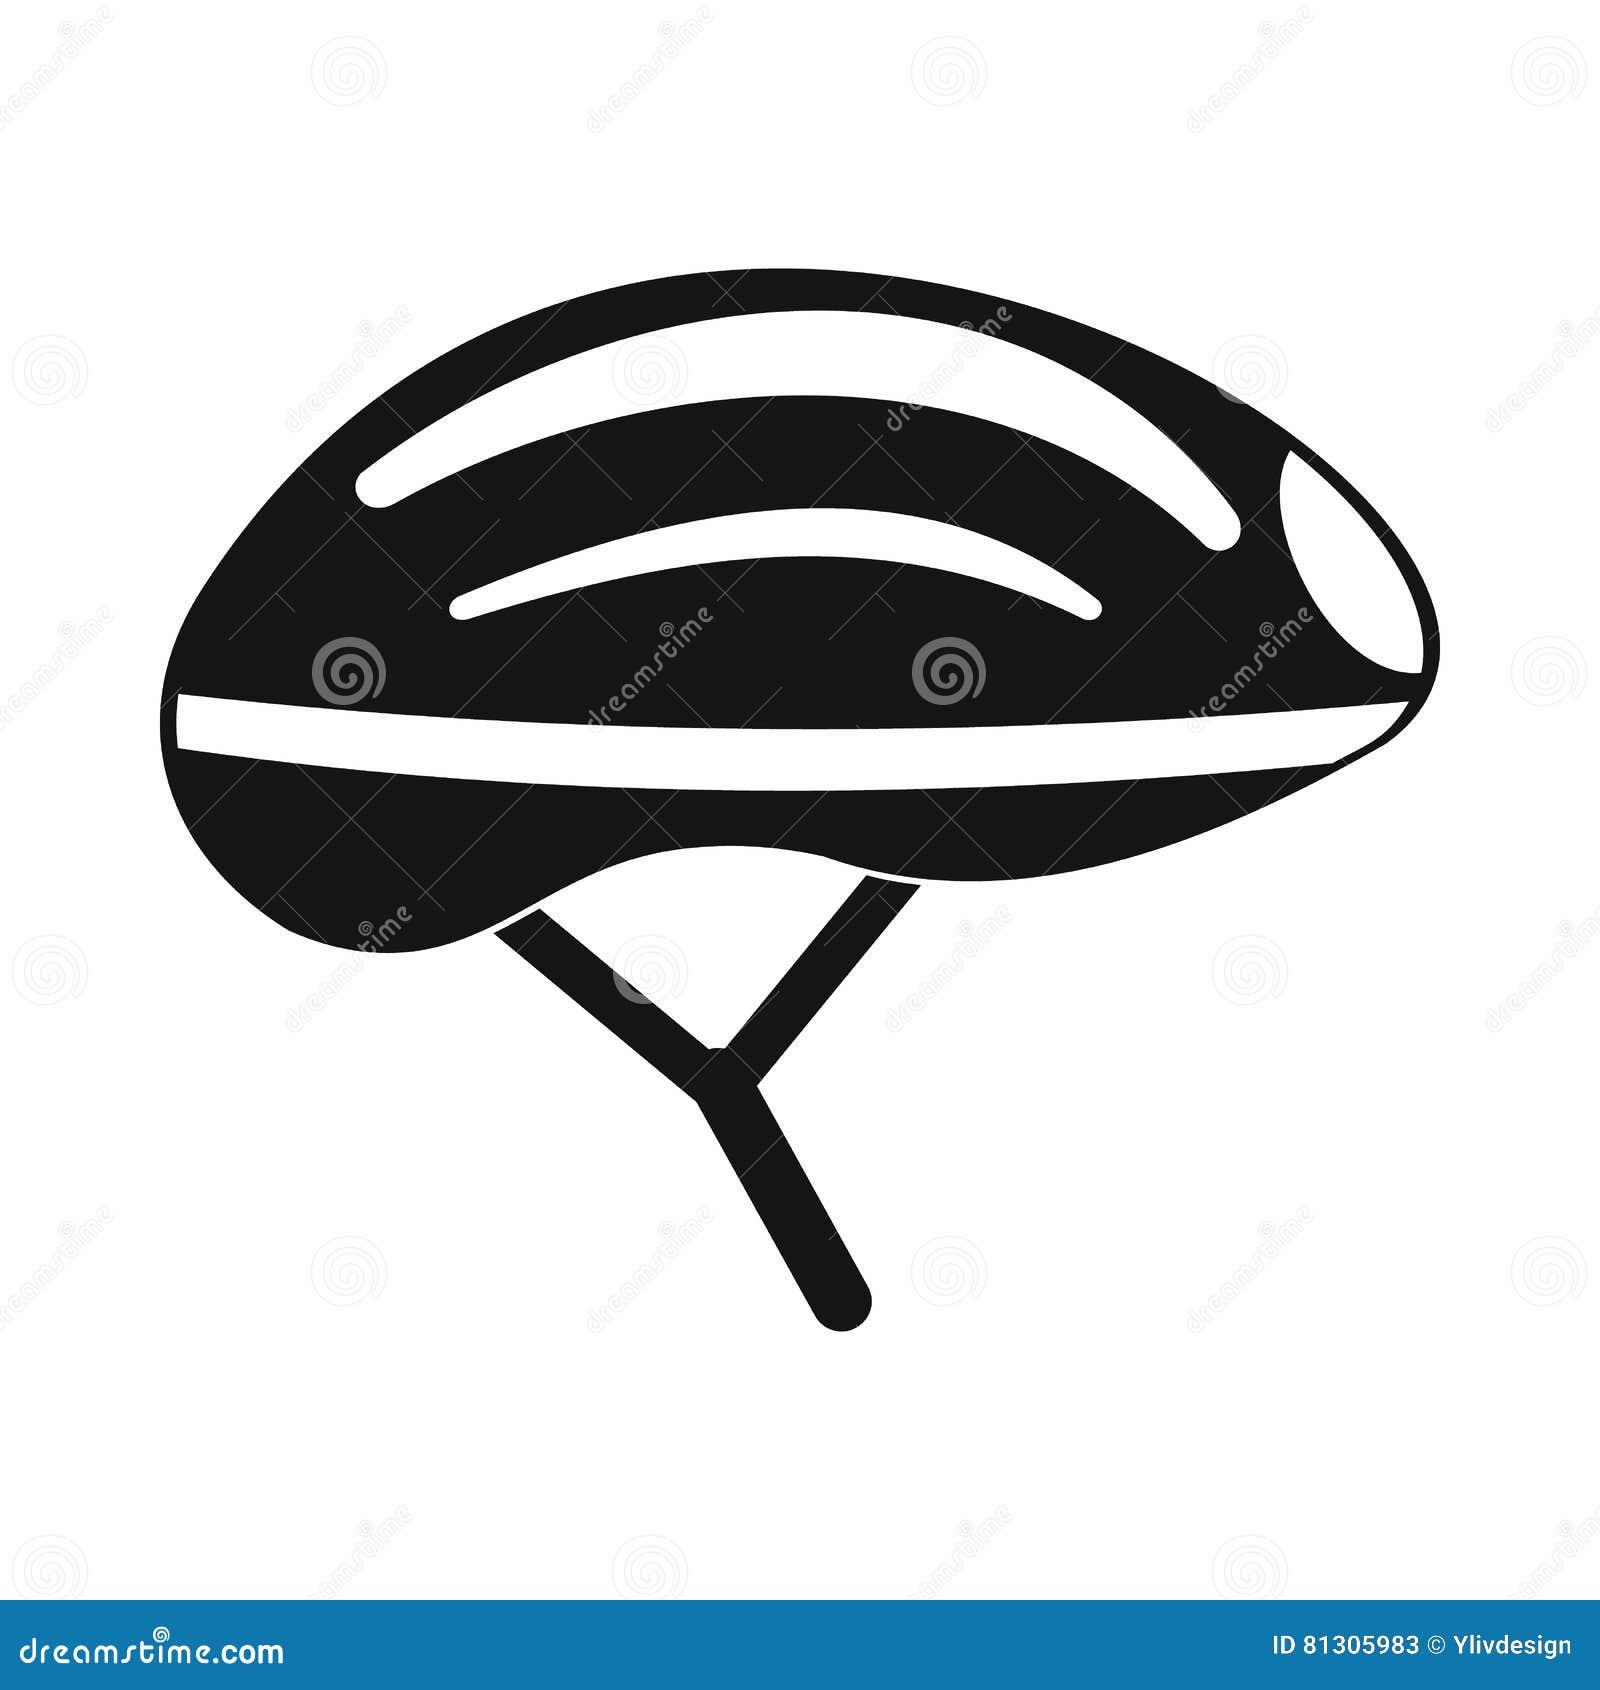 Bicycle Helmet Icon, Simple Style Stock Vector